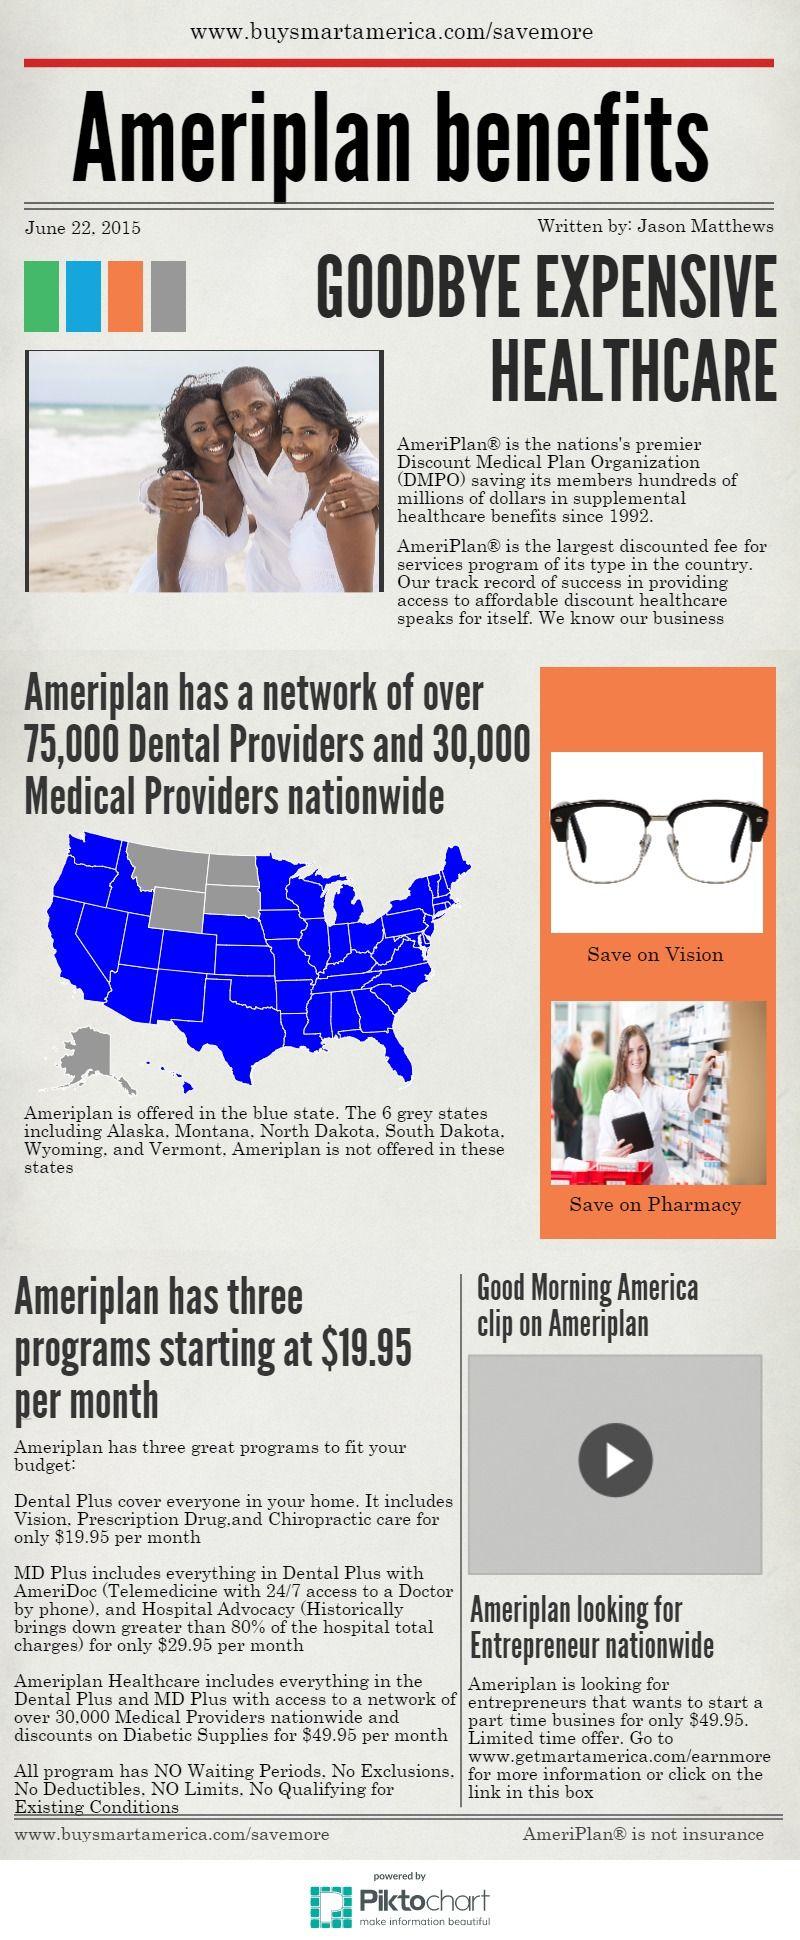 Ameriplan Benefits Piktochart Mobile App Health Care